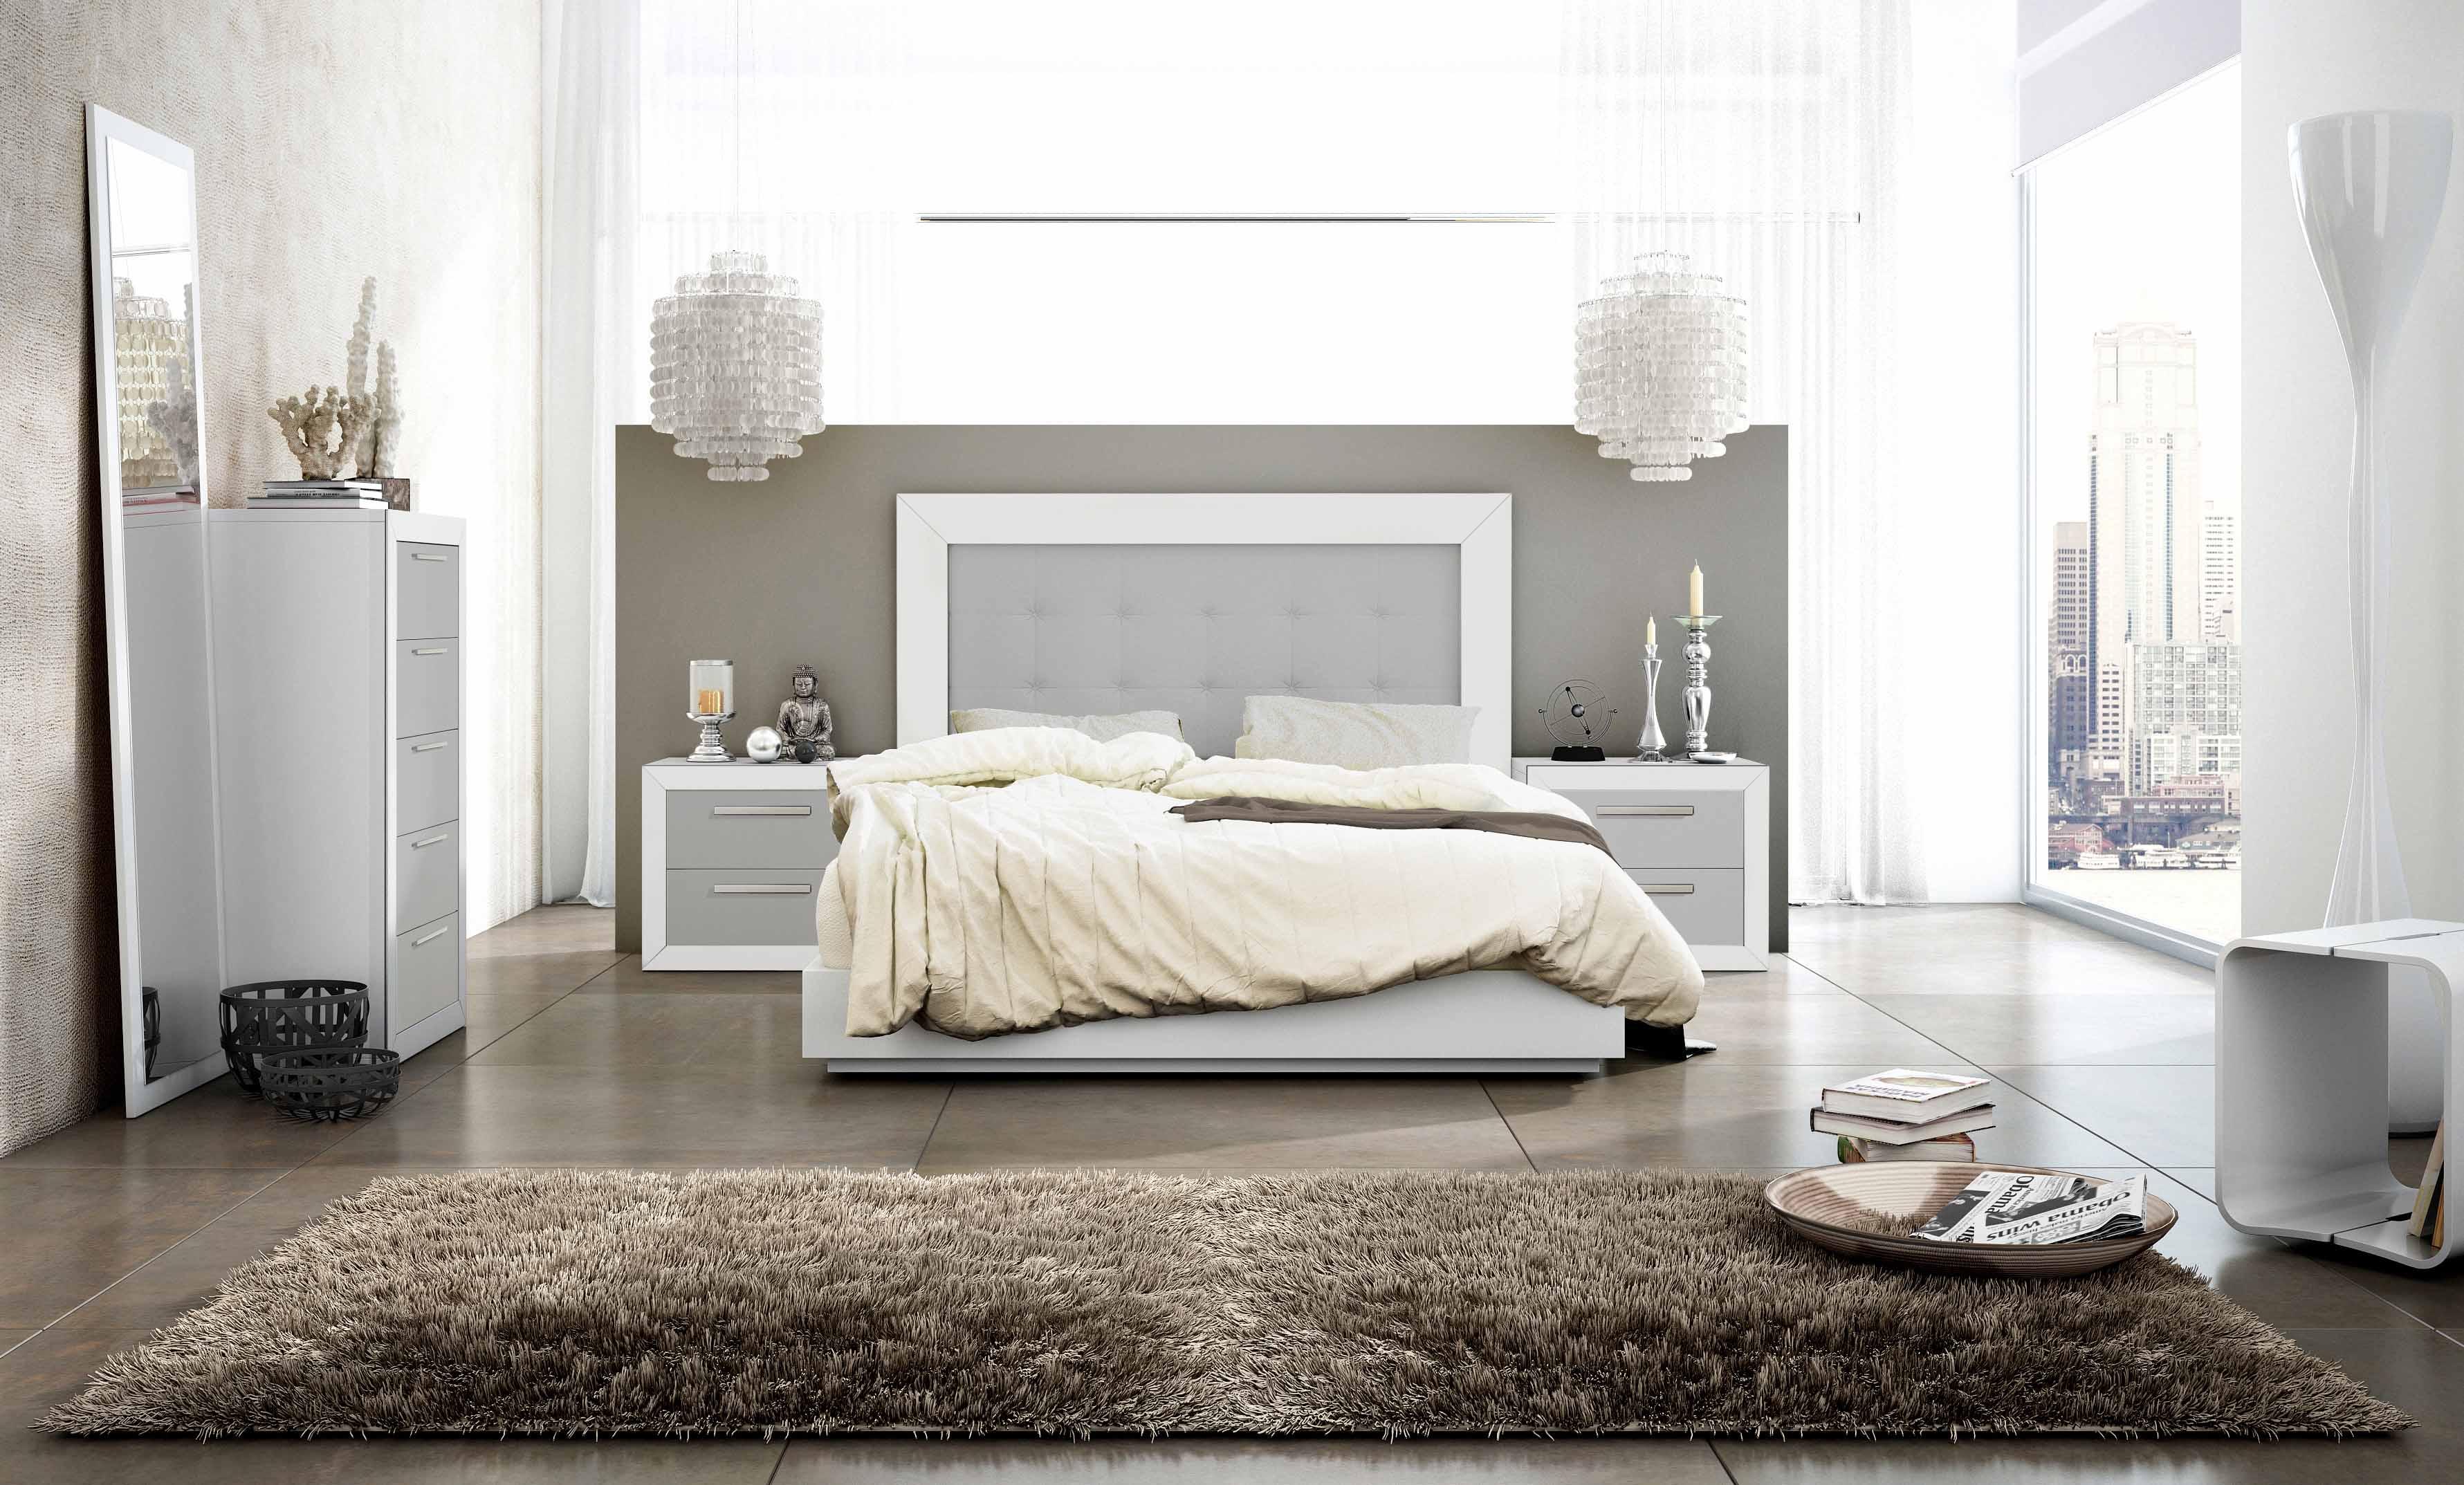 dormitorios modernos en blanco y plata dise os